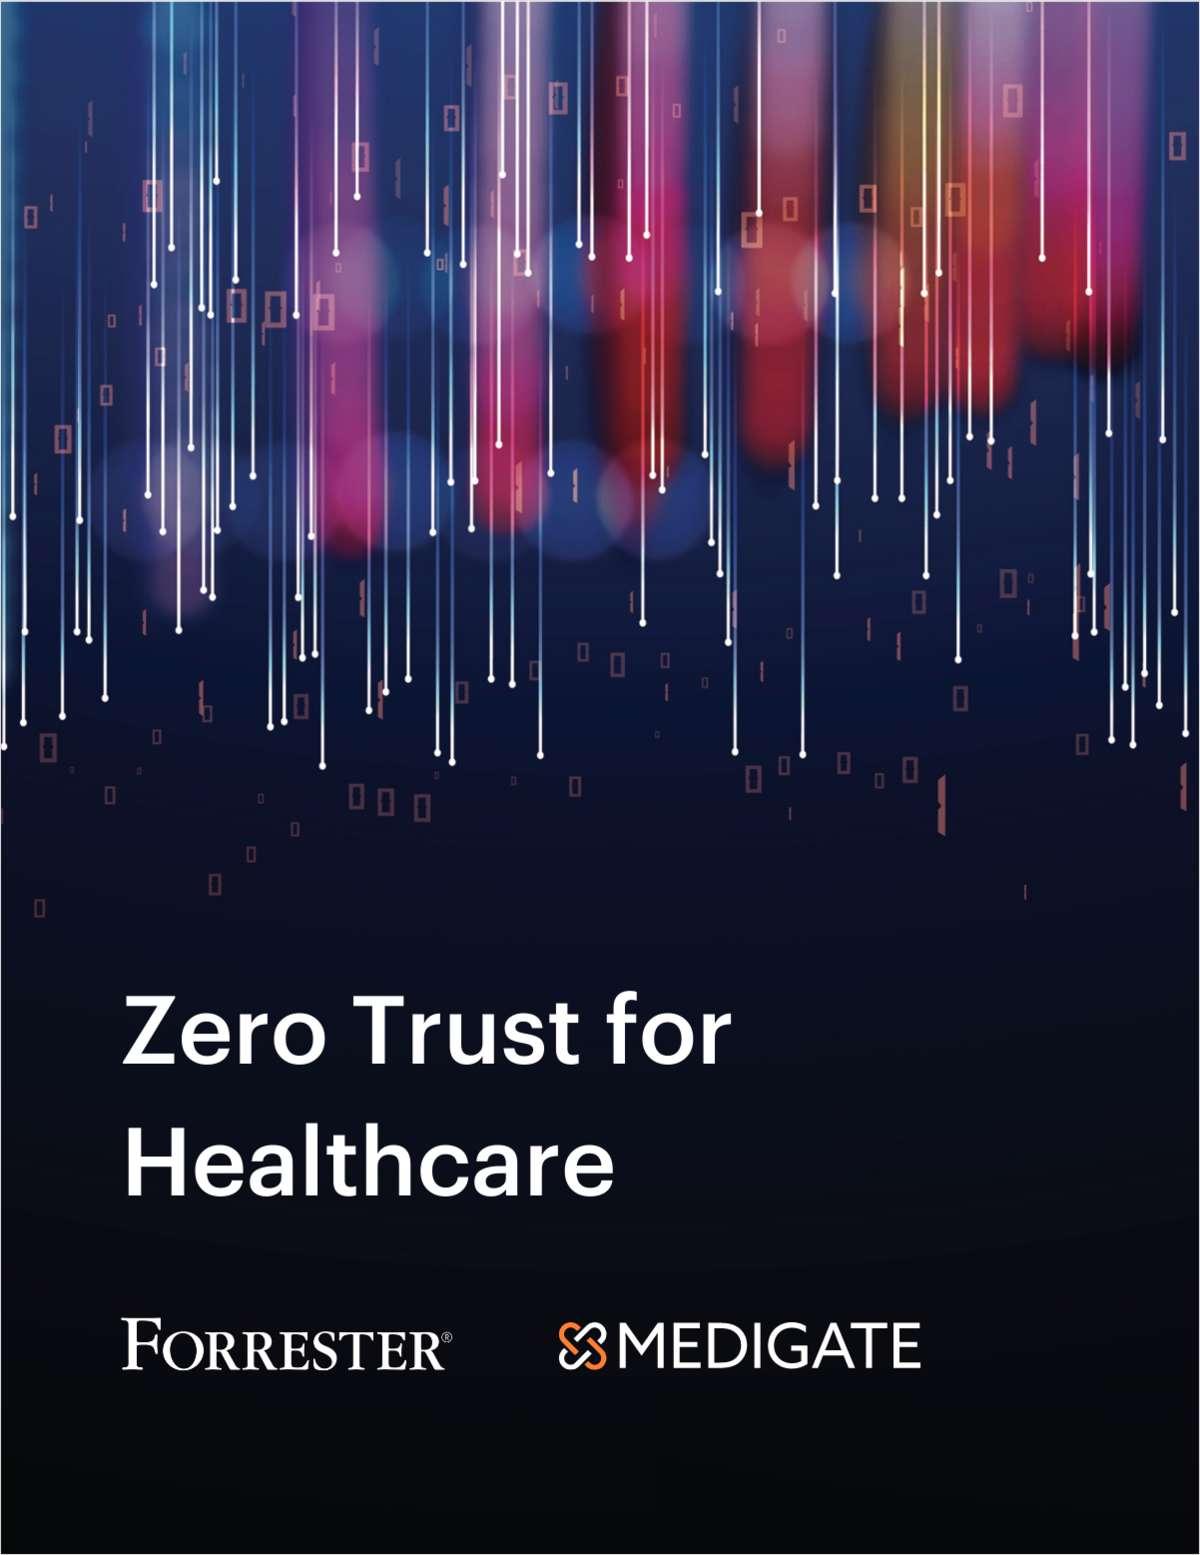 Zero Trust for Healthcare